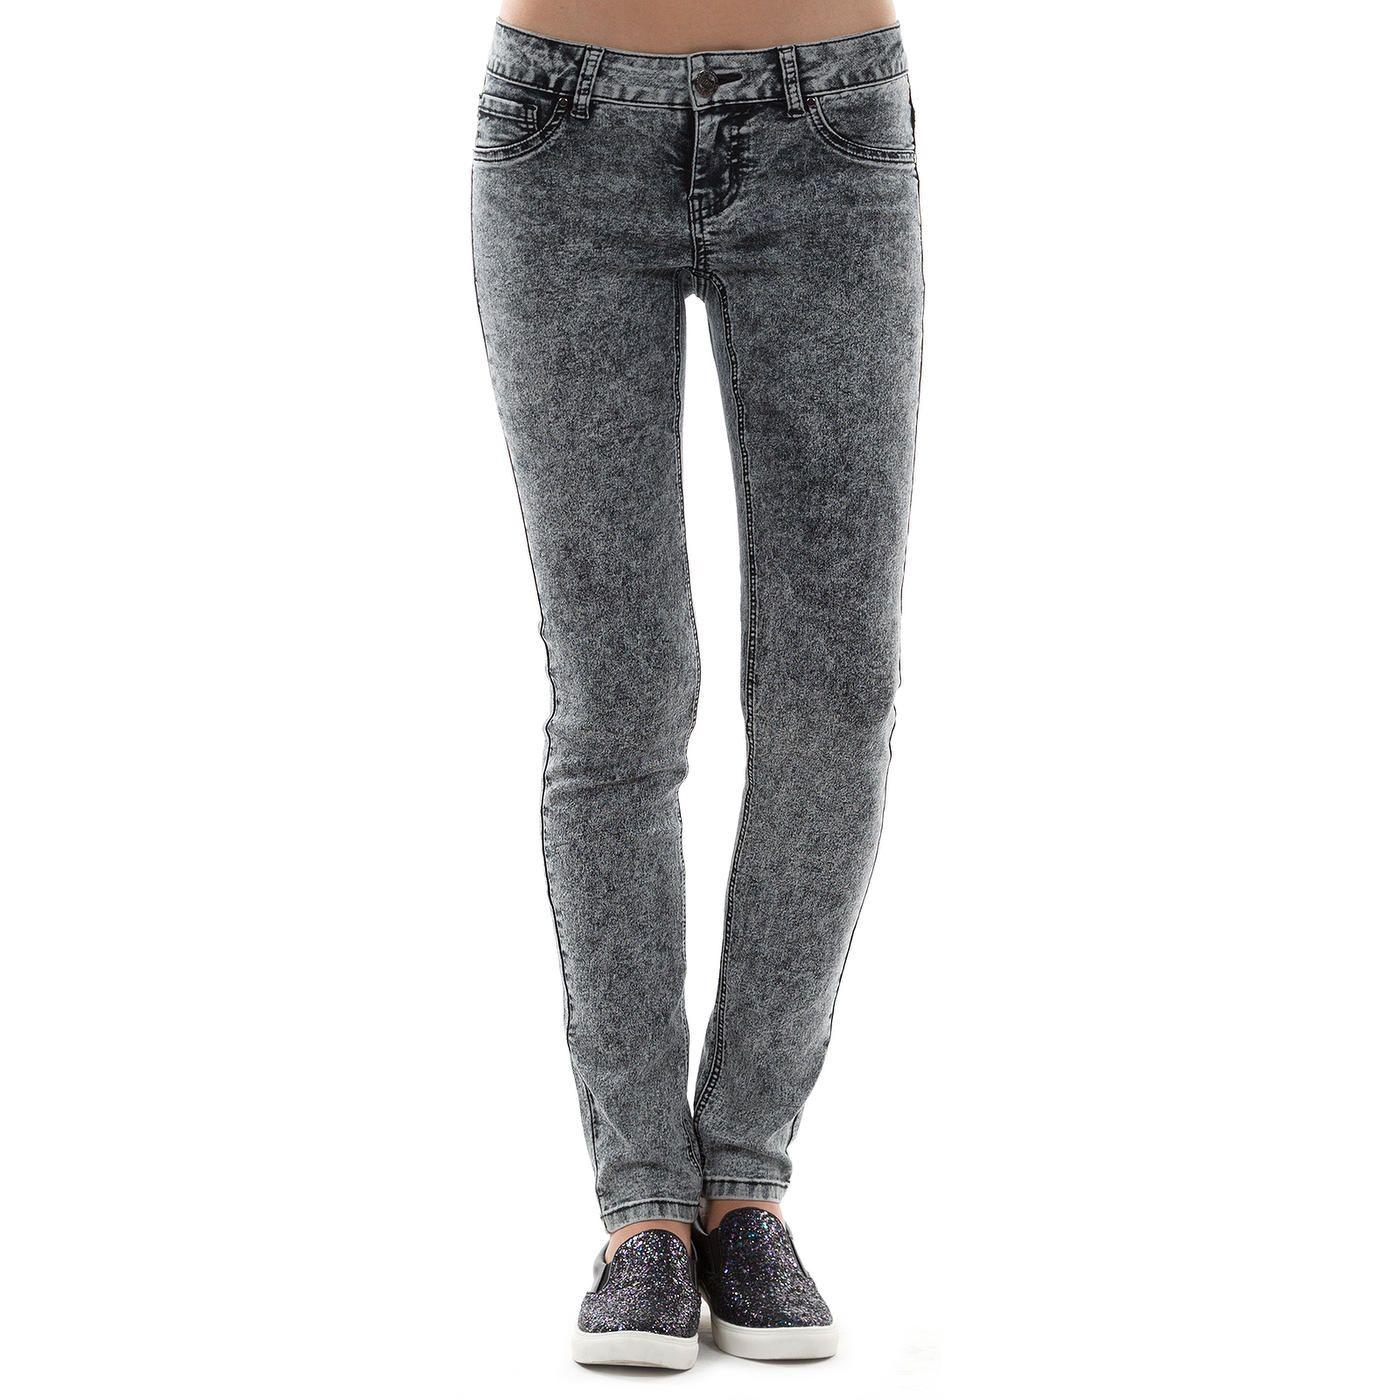 Jean skinny délavé gris cl - MIM  jean  skinny   Jeans denim   Denim ... e9acd18787c